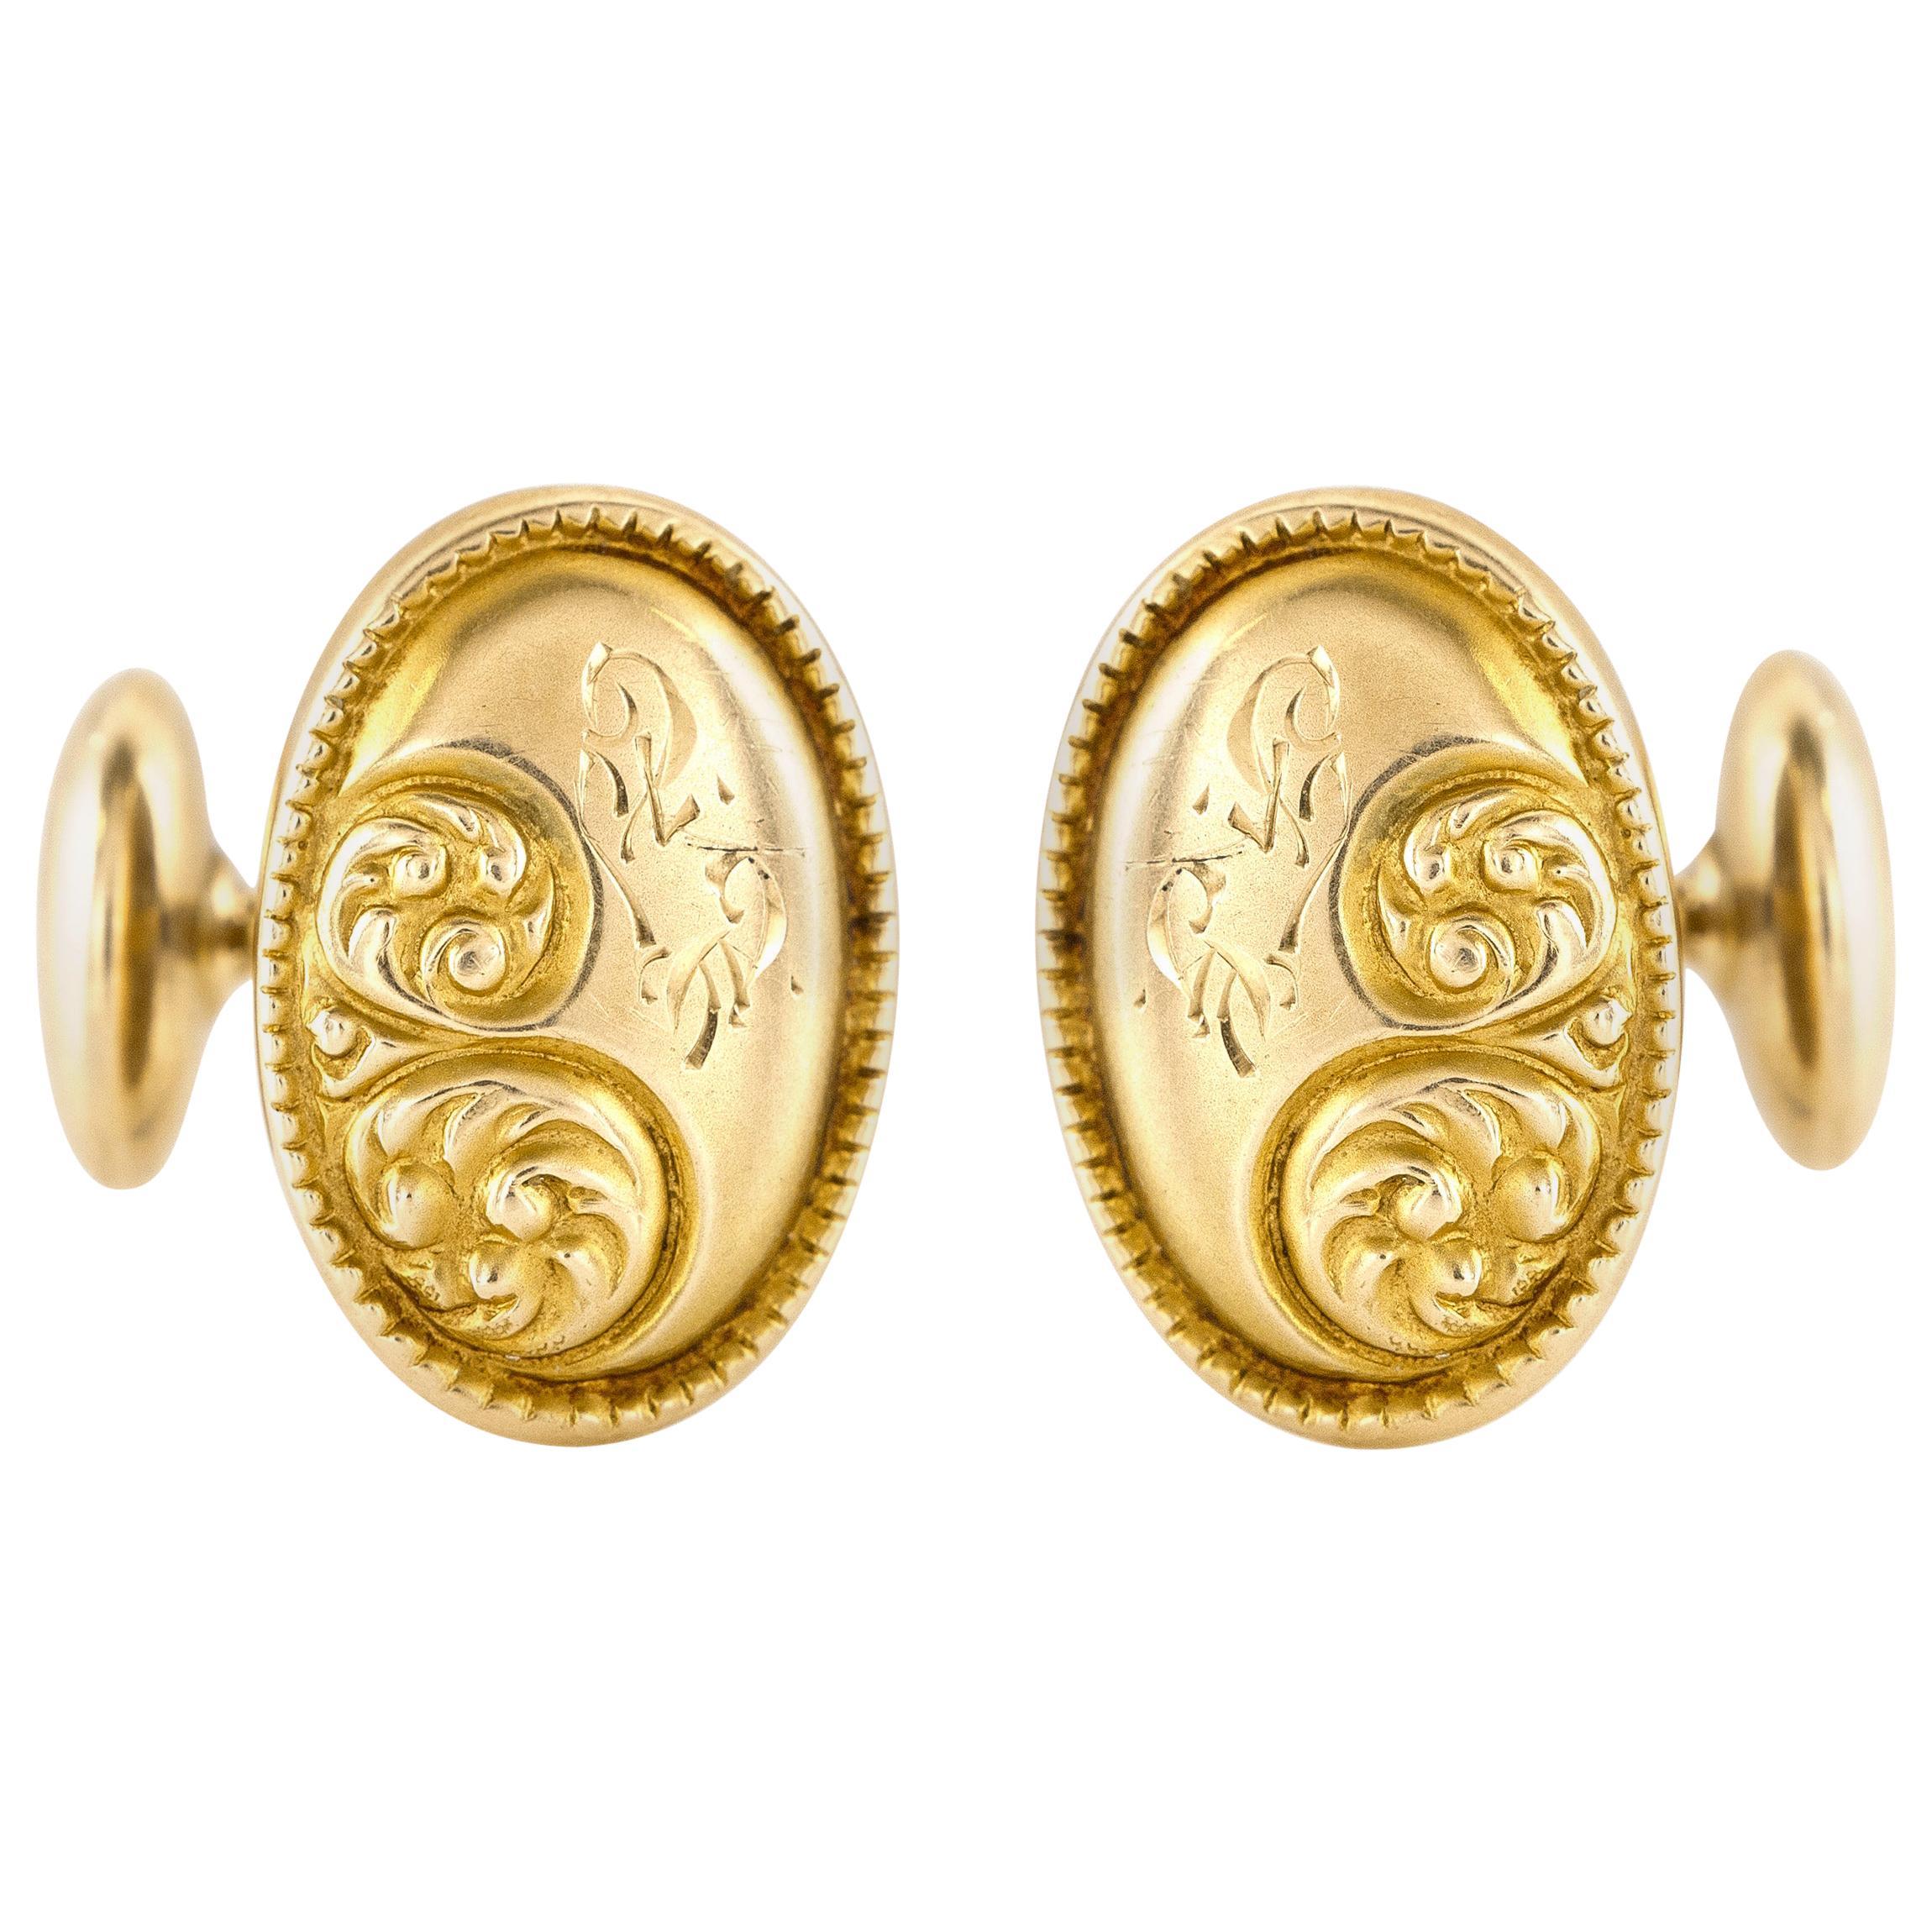 Oval Gold Floral Motif Cufflinks